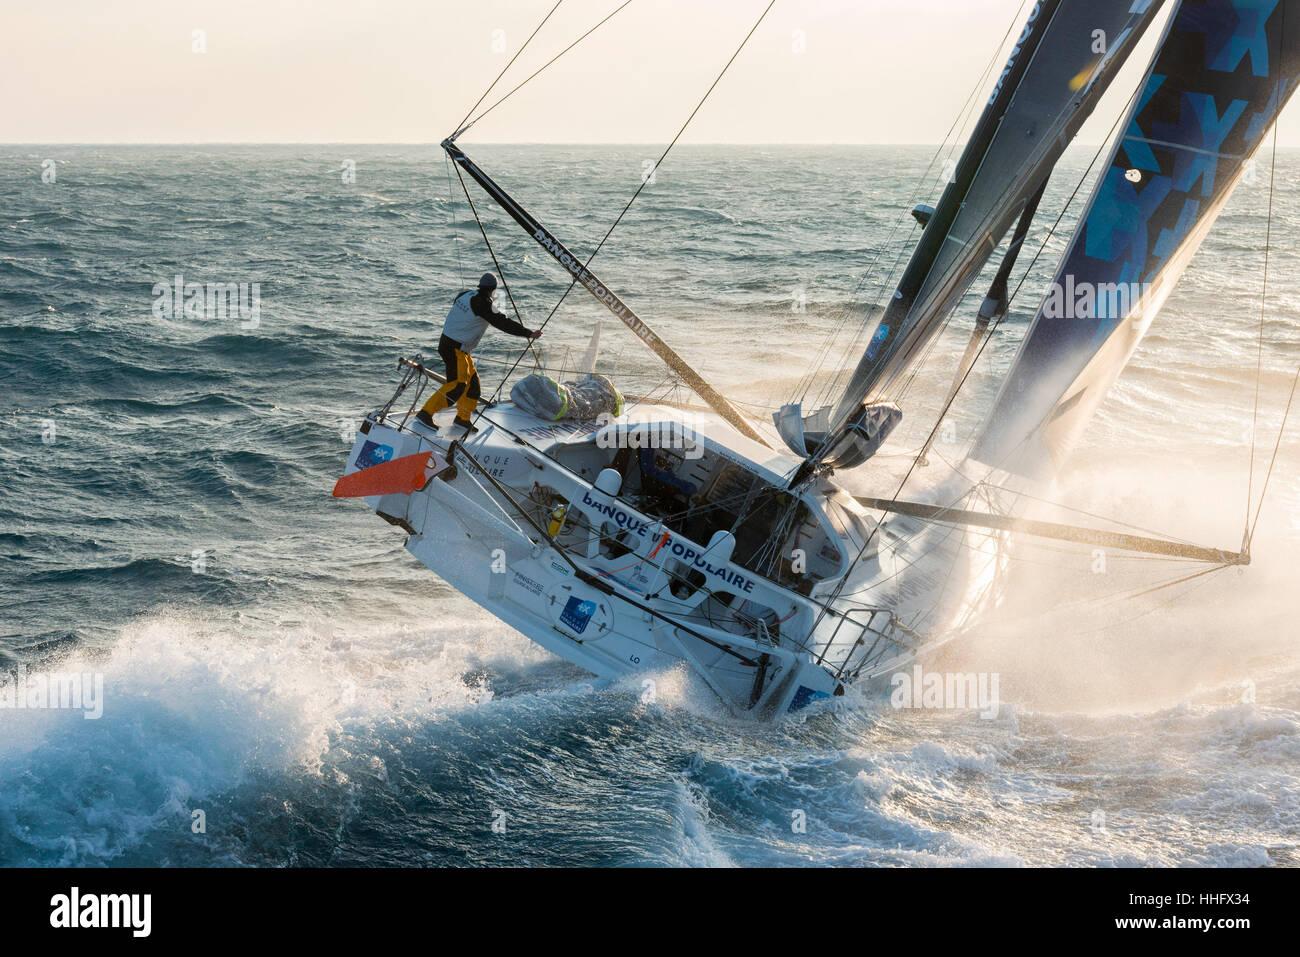 Regata Vendée Globe 2017: Armel Le Cléac'h a bordo del Banque Populaire VIII monocasco de vela (2017/01/19) Foto de stock